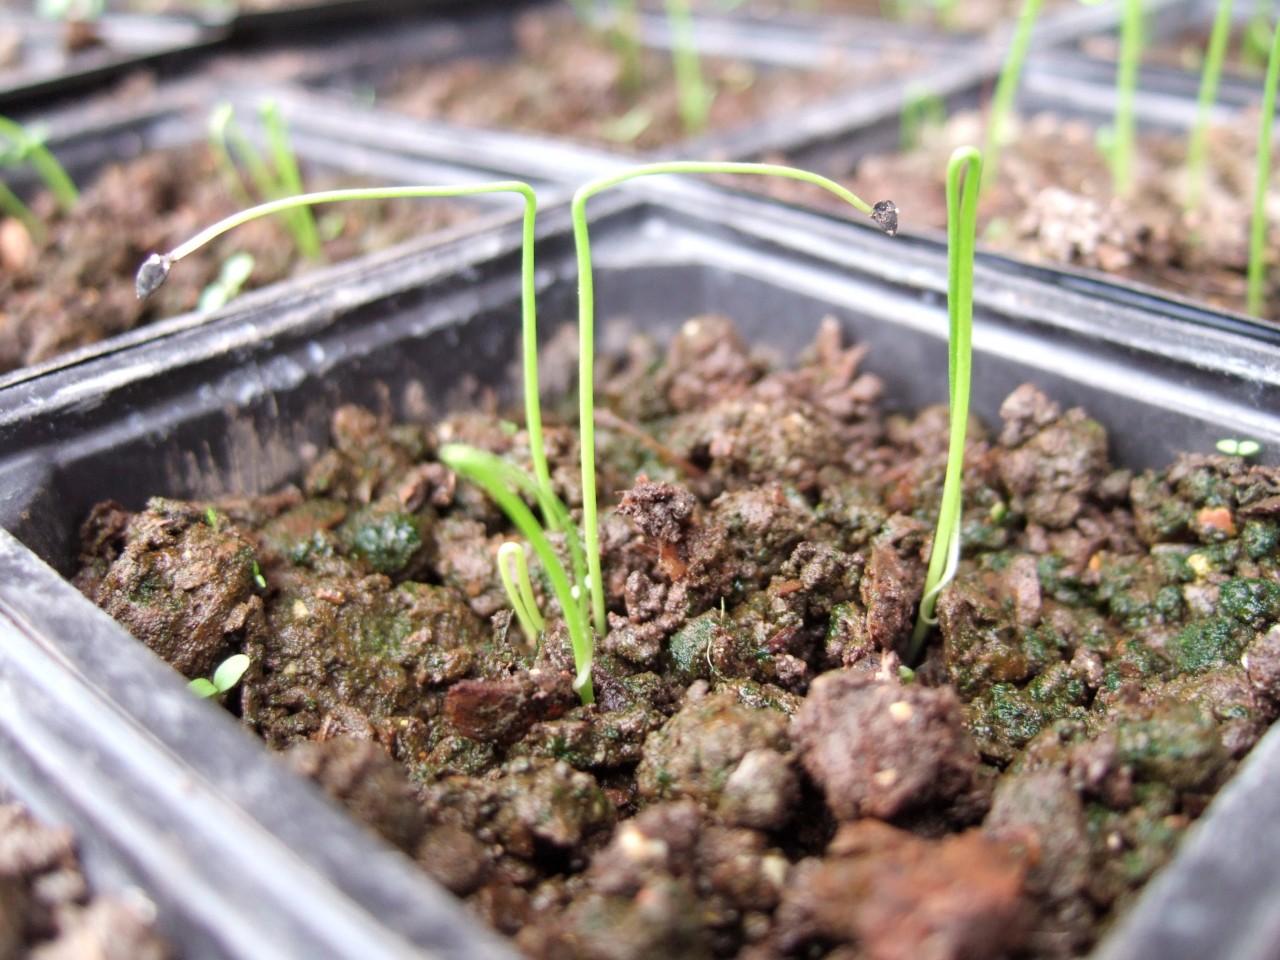 когда производить посев семян на рассаду